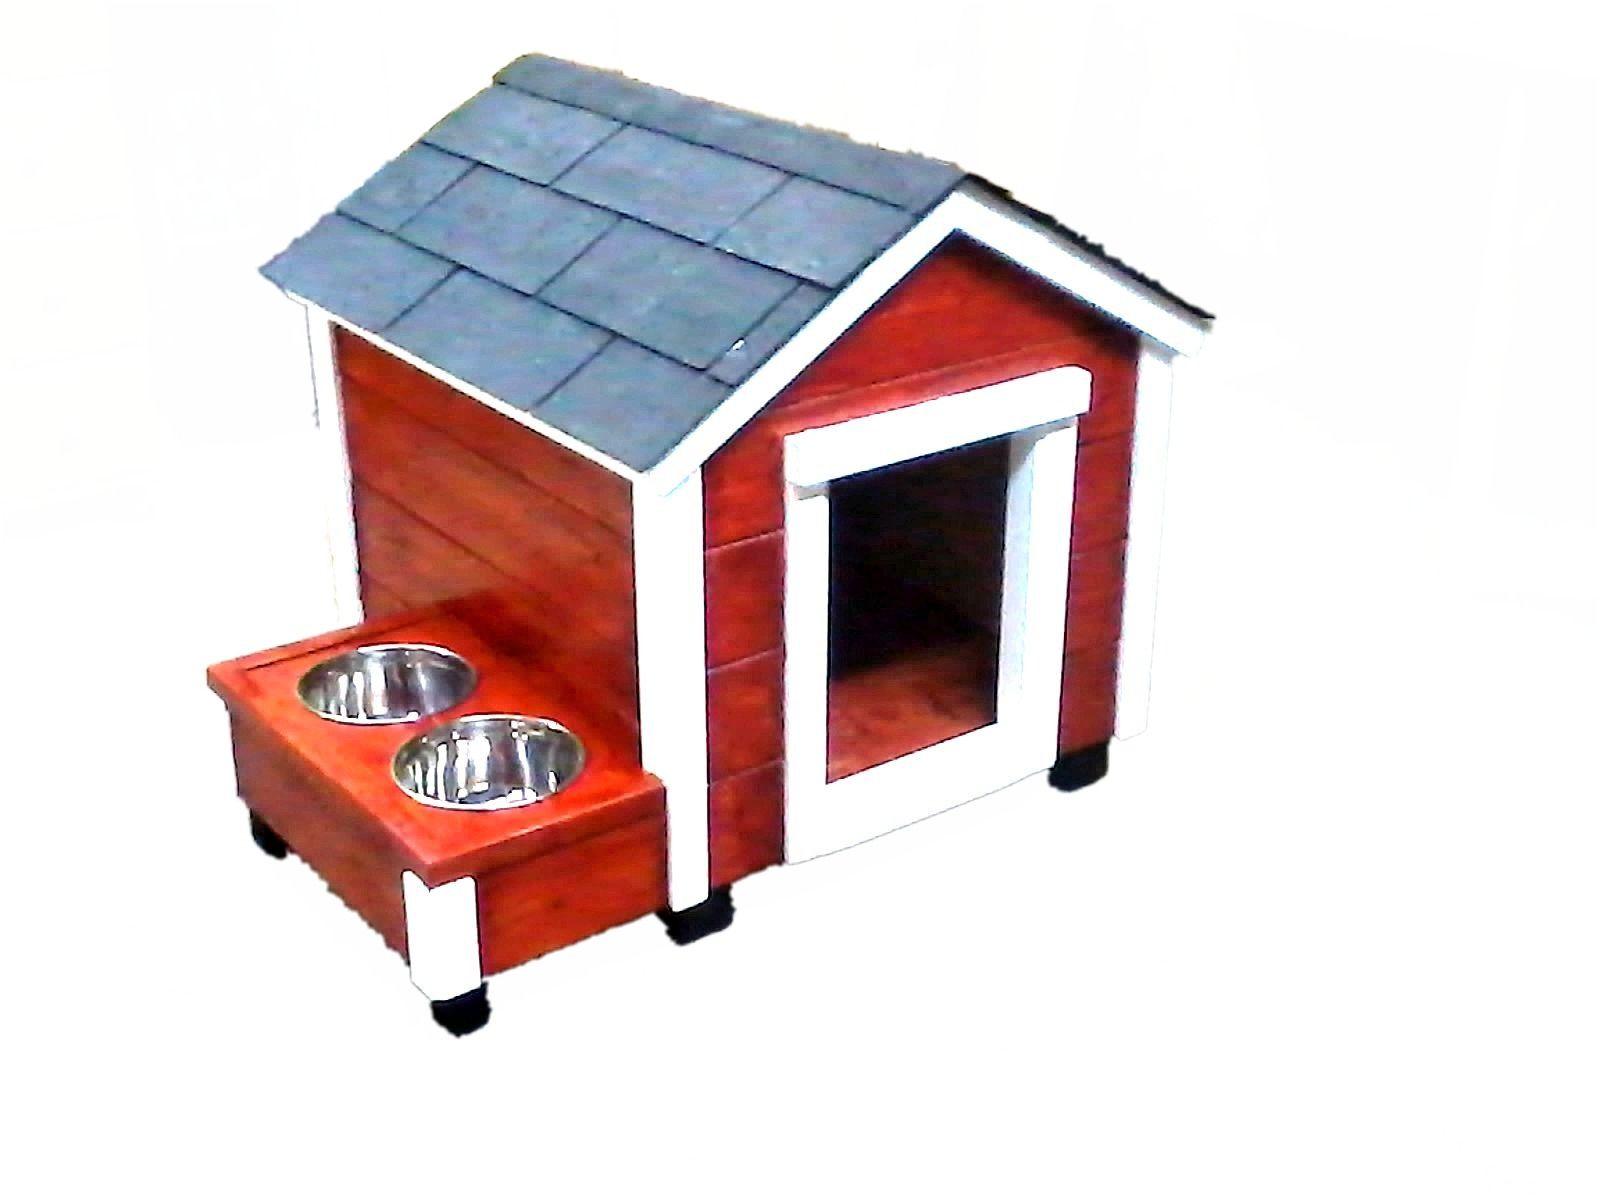 Casetas de madera para perros anuncios gratis barcelona for Casetas para perros aki